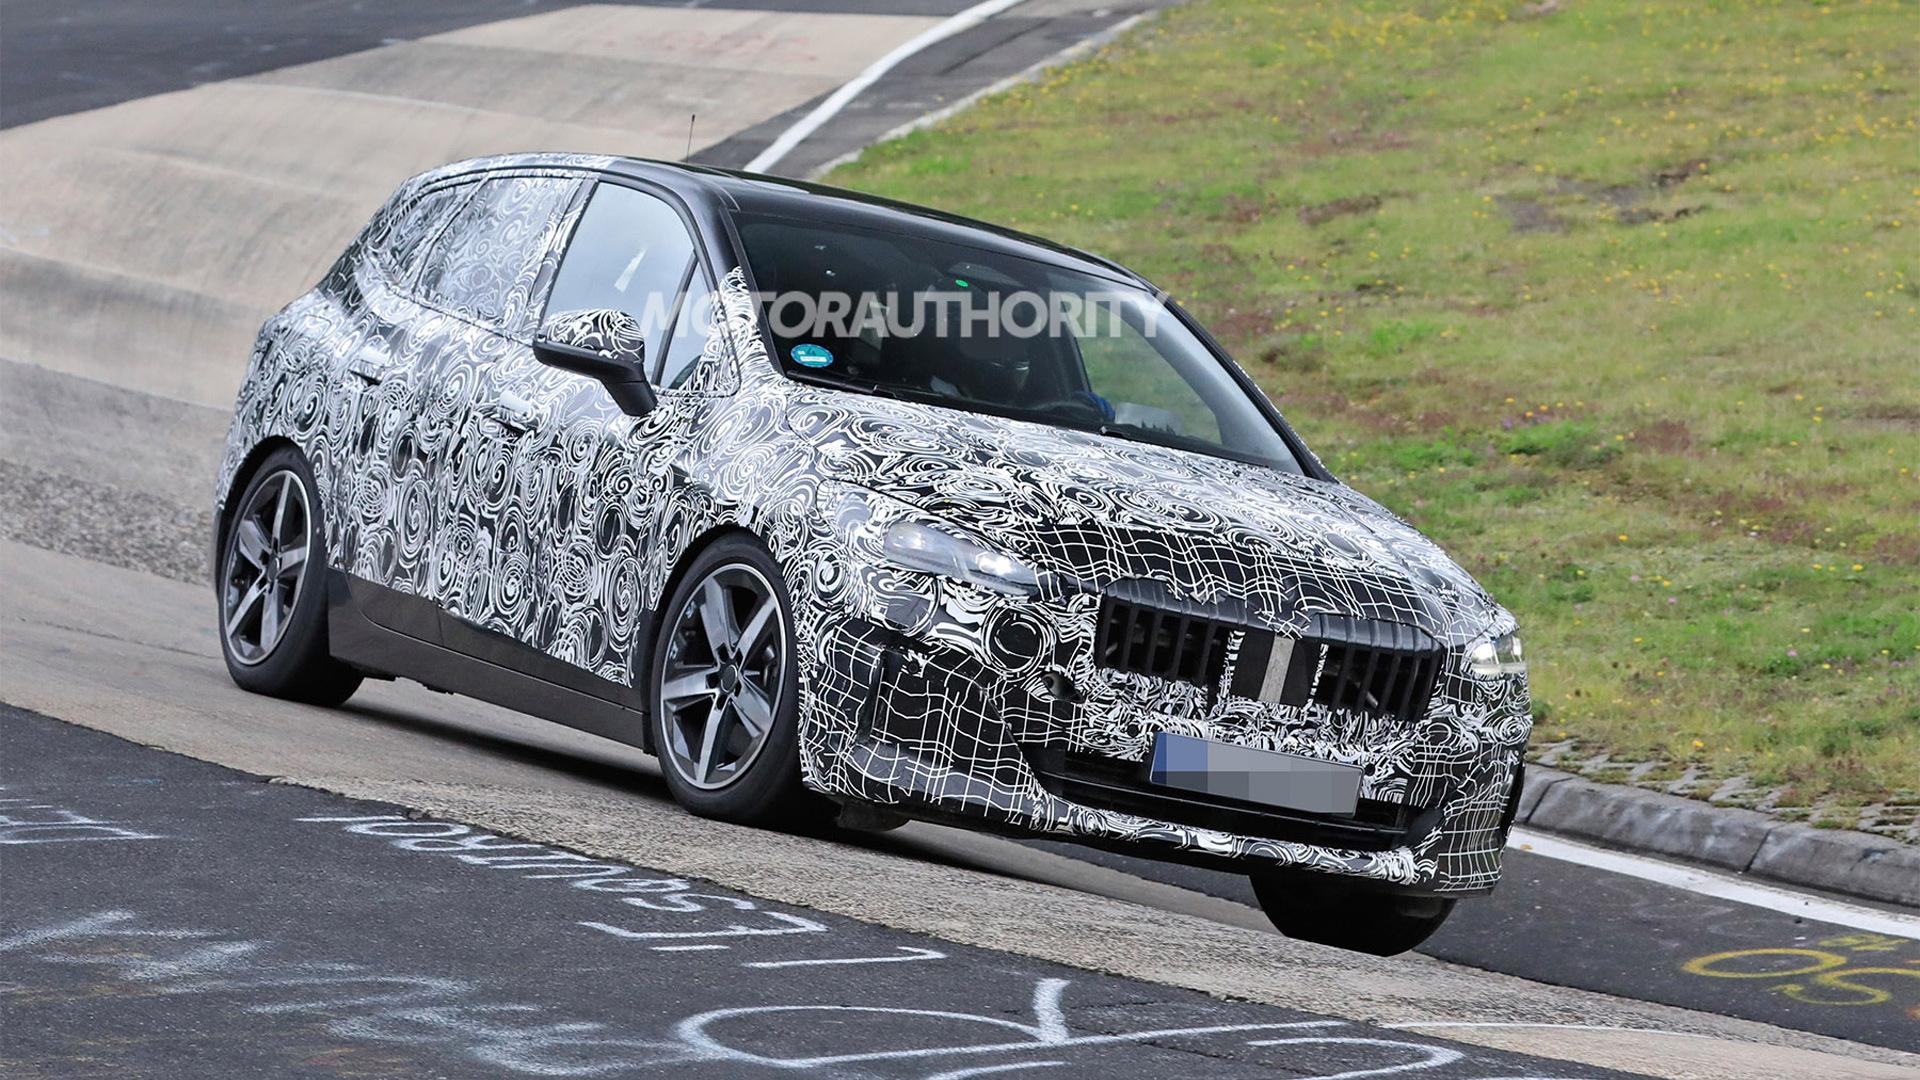 2022 BMW 2-Series Active Tourer spy shots - Photo credit: S. Baldauf/SB-Medien